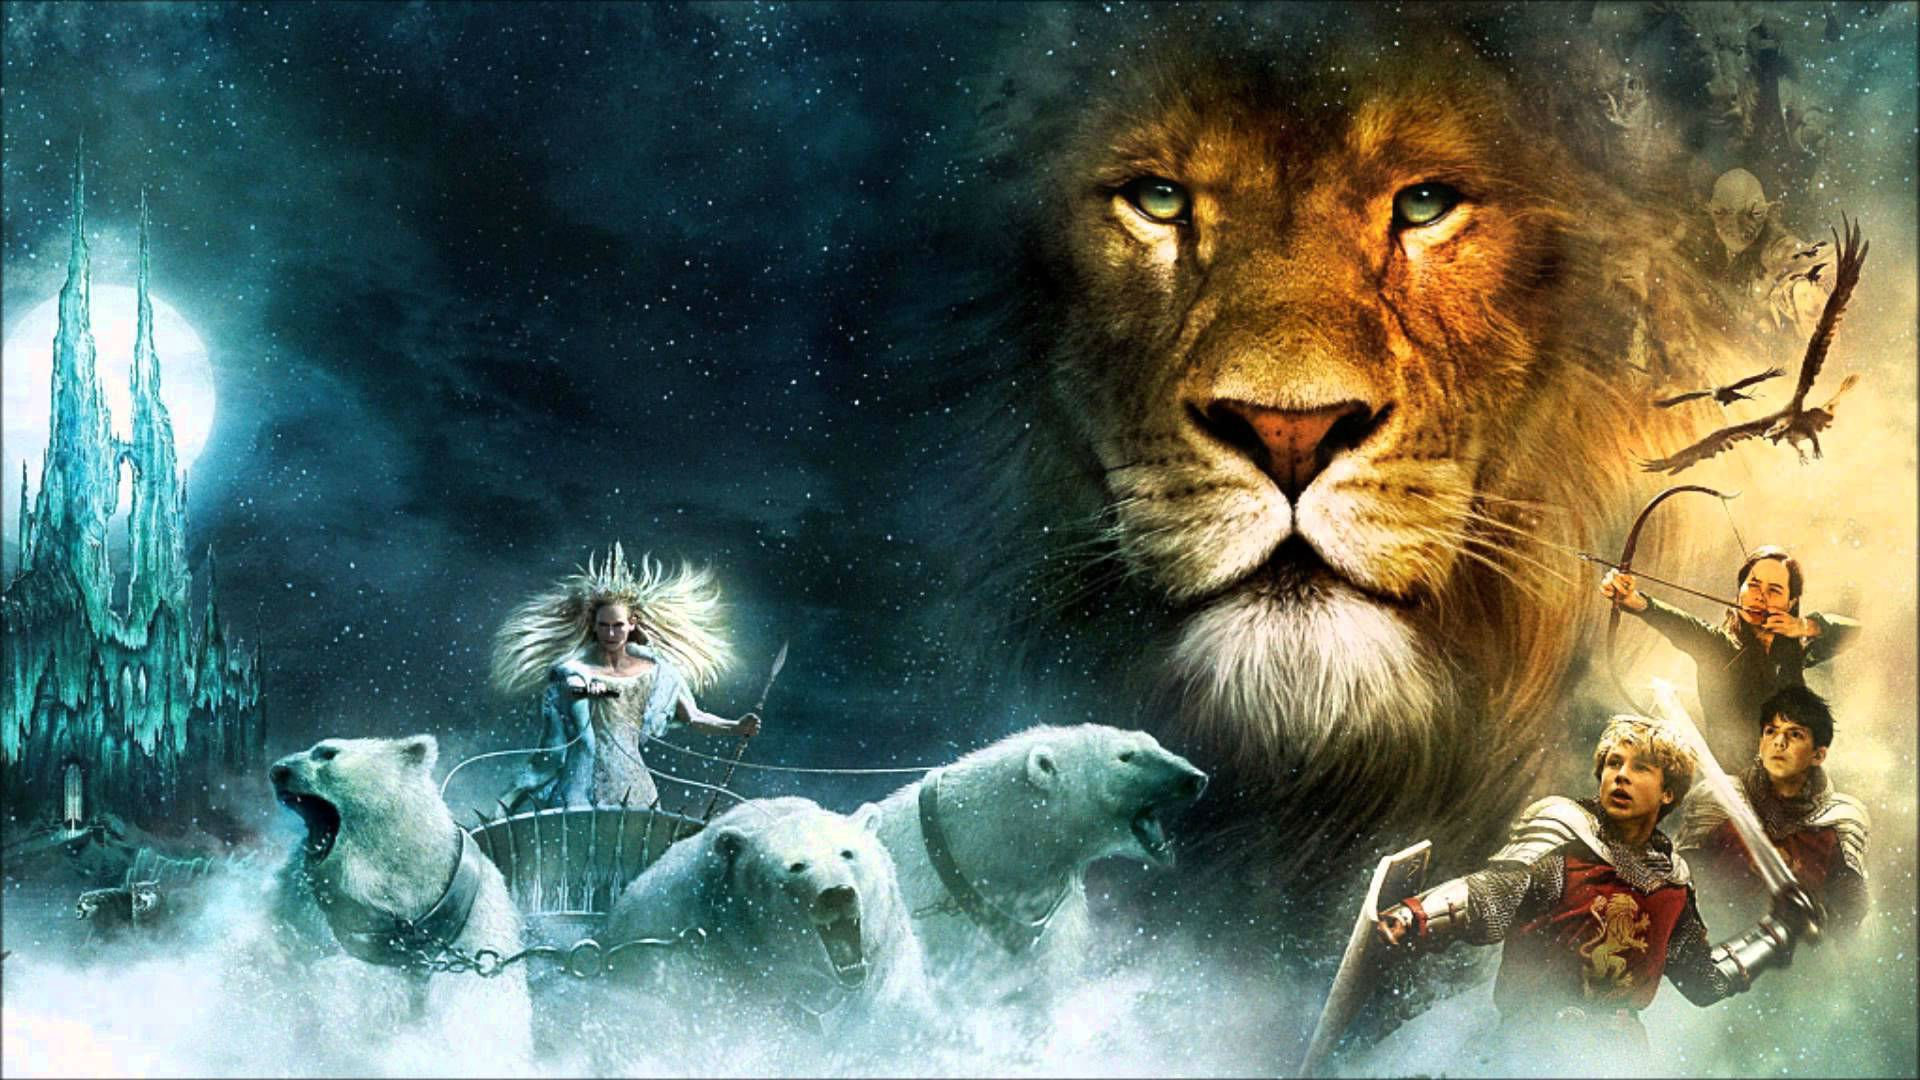 narnia adventure fantasy family series book 1narnia chronicles